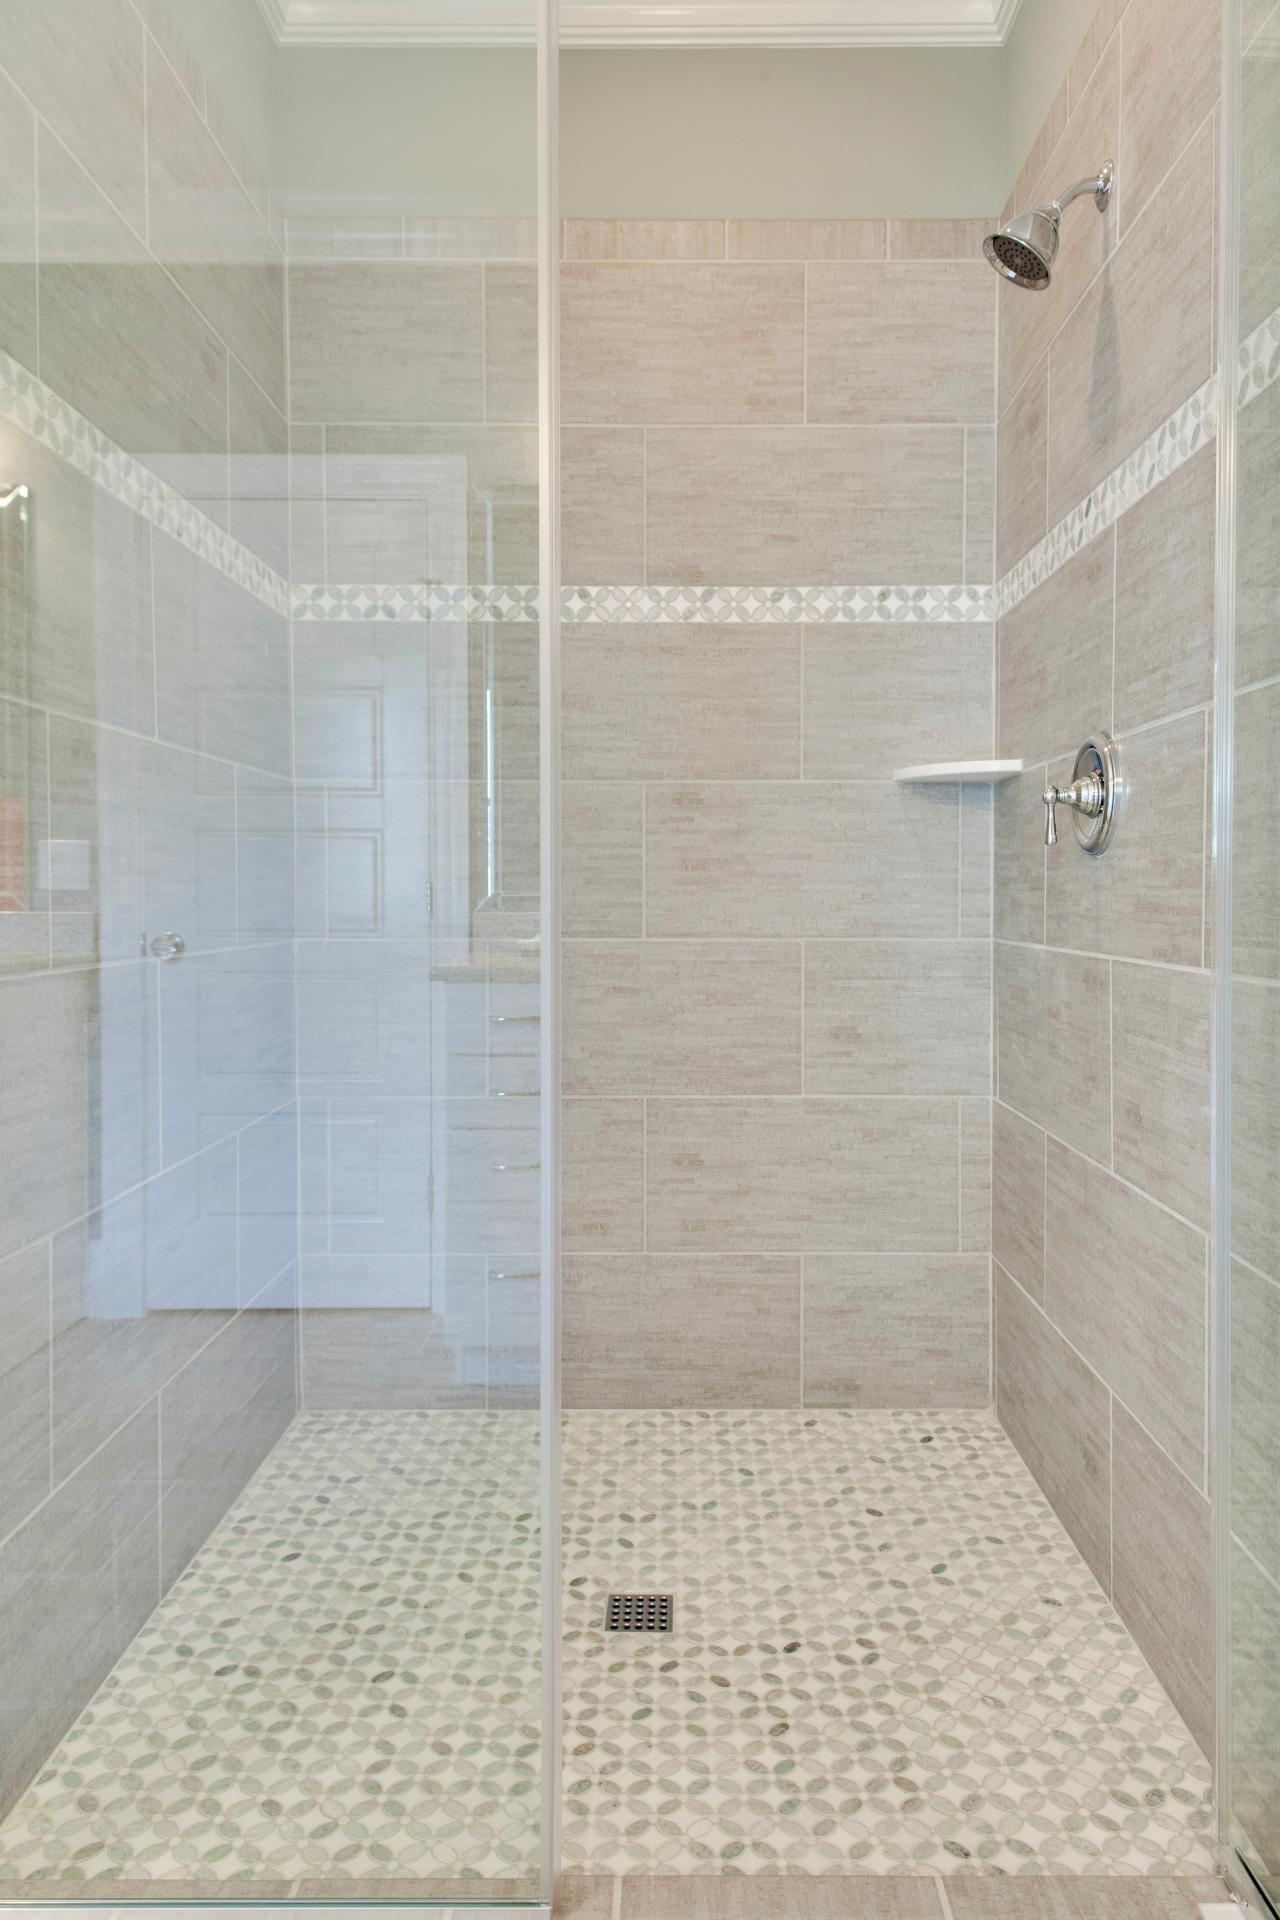 Bathroom Remodel And Upgrade Laguna Kitchen And Bath In Oc